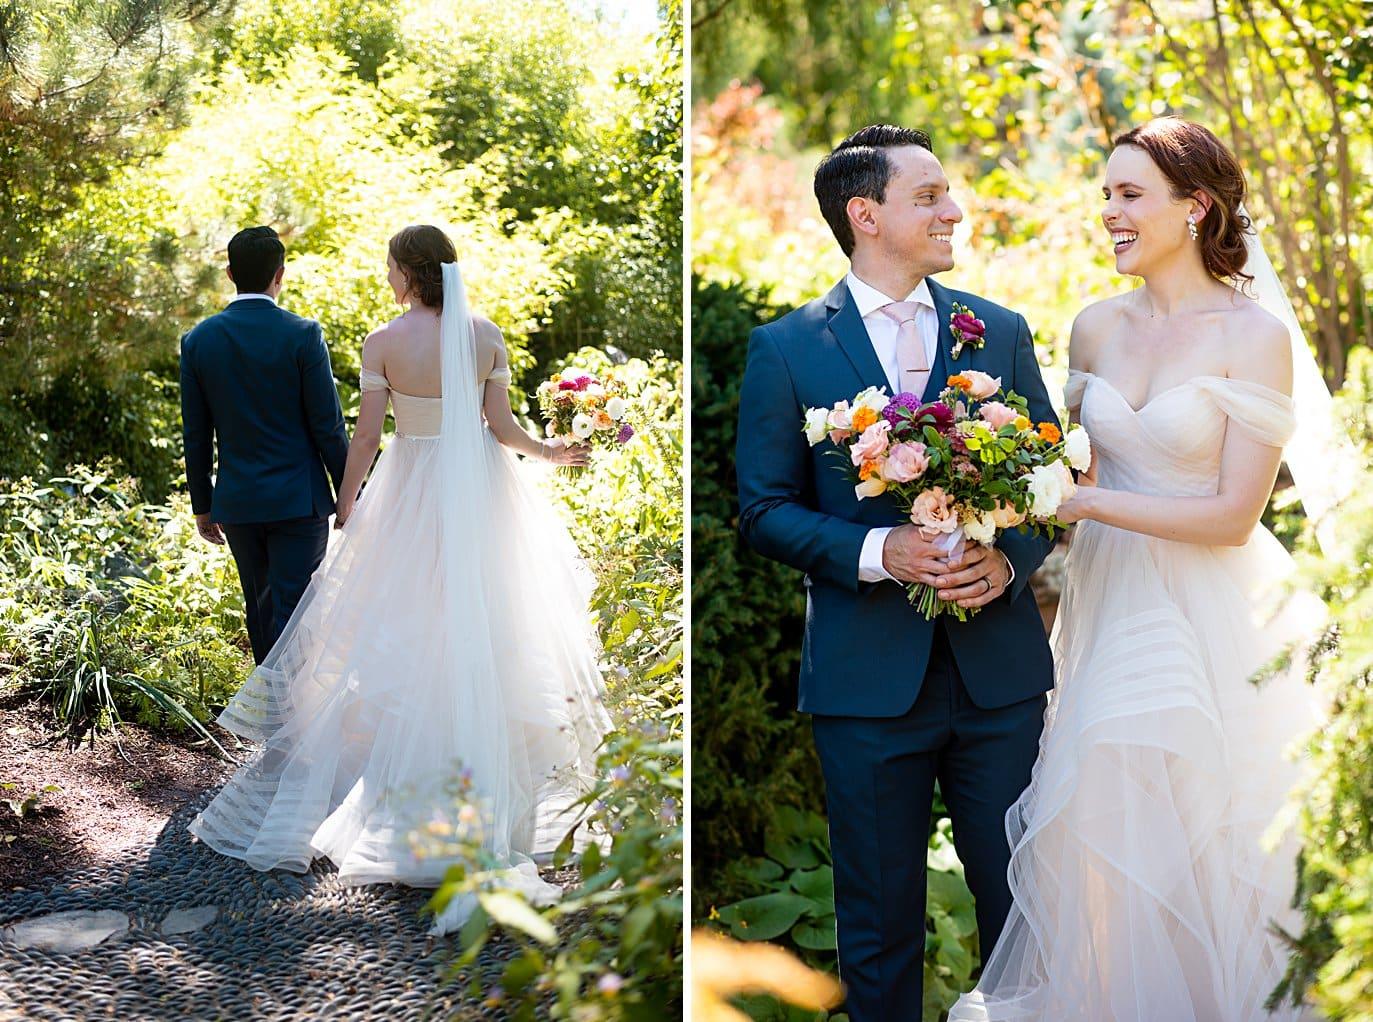 bride and groom walk in gardens after ceremony at Denver Botanic Gardens microwedding by Boulder wedding photographer Jennie Crate